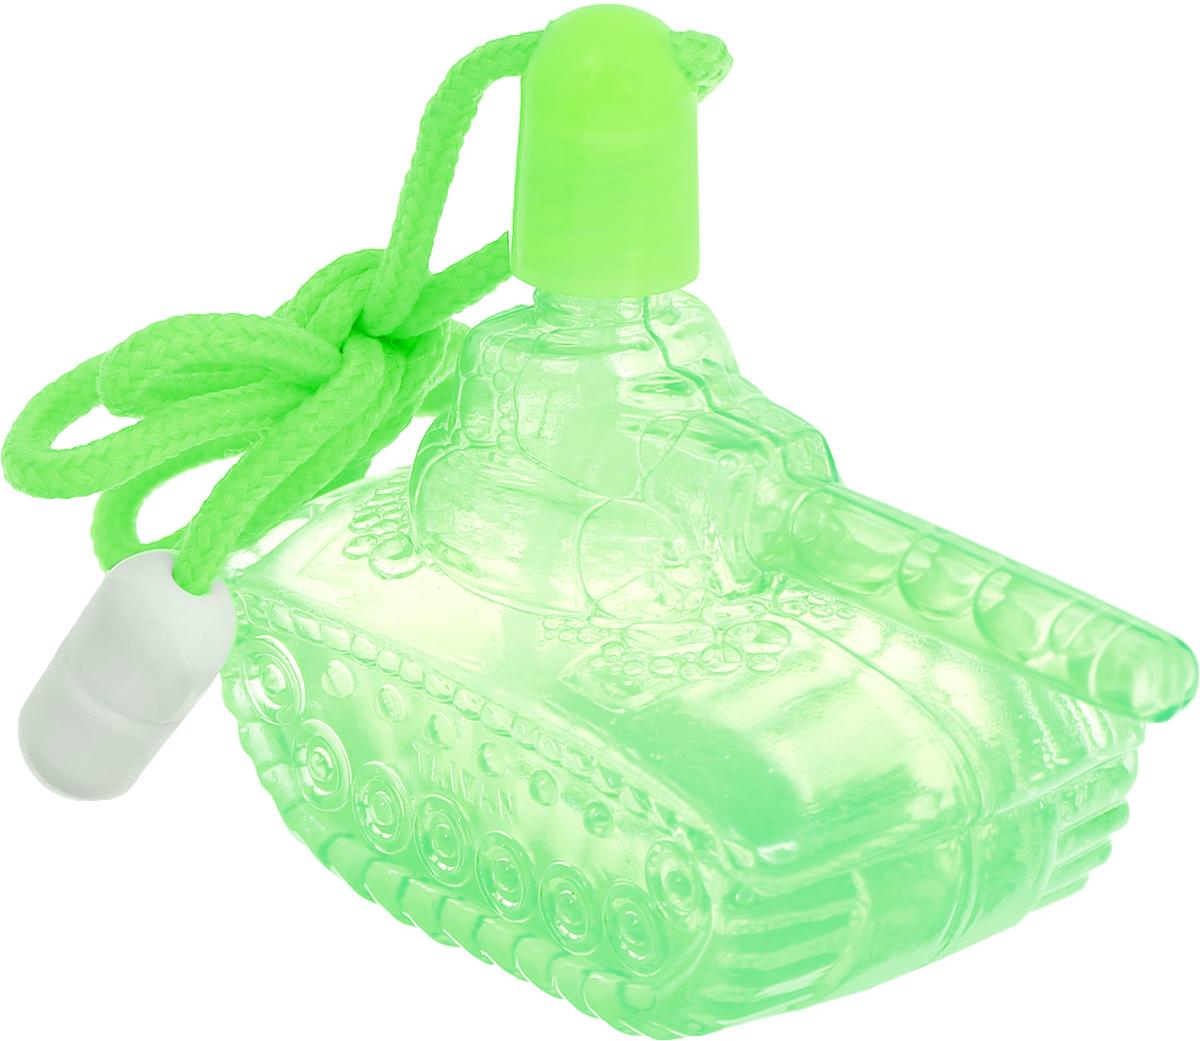 Uncle Bubble Мыльные пузыри Танк цвет зеленый